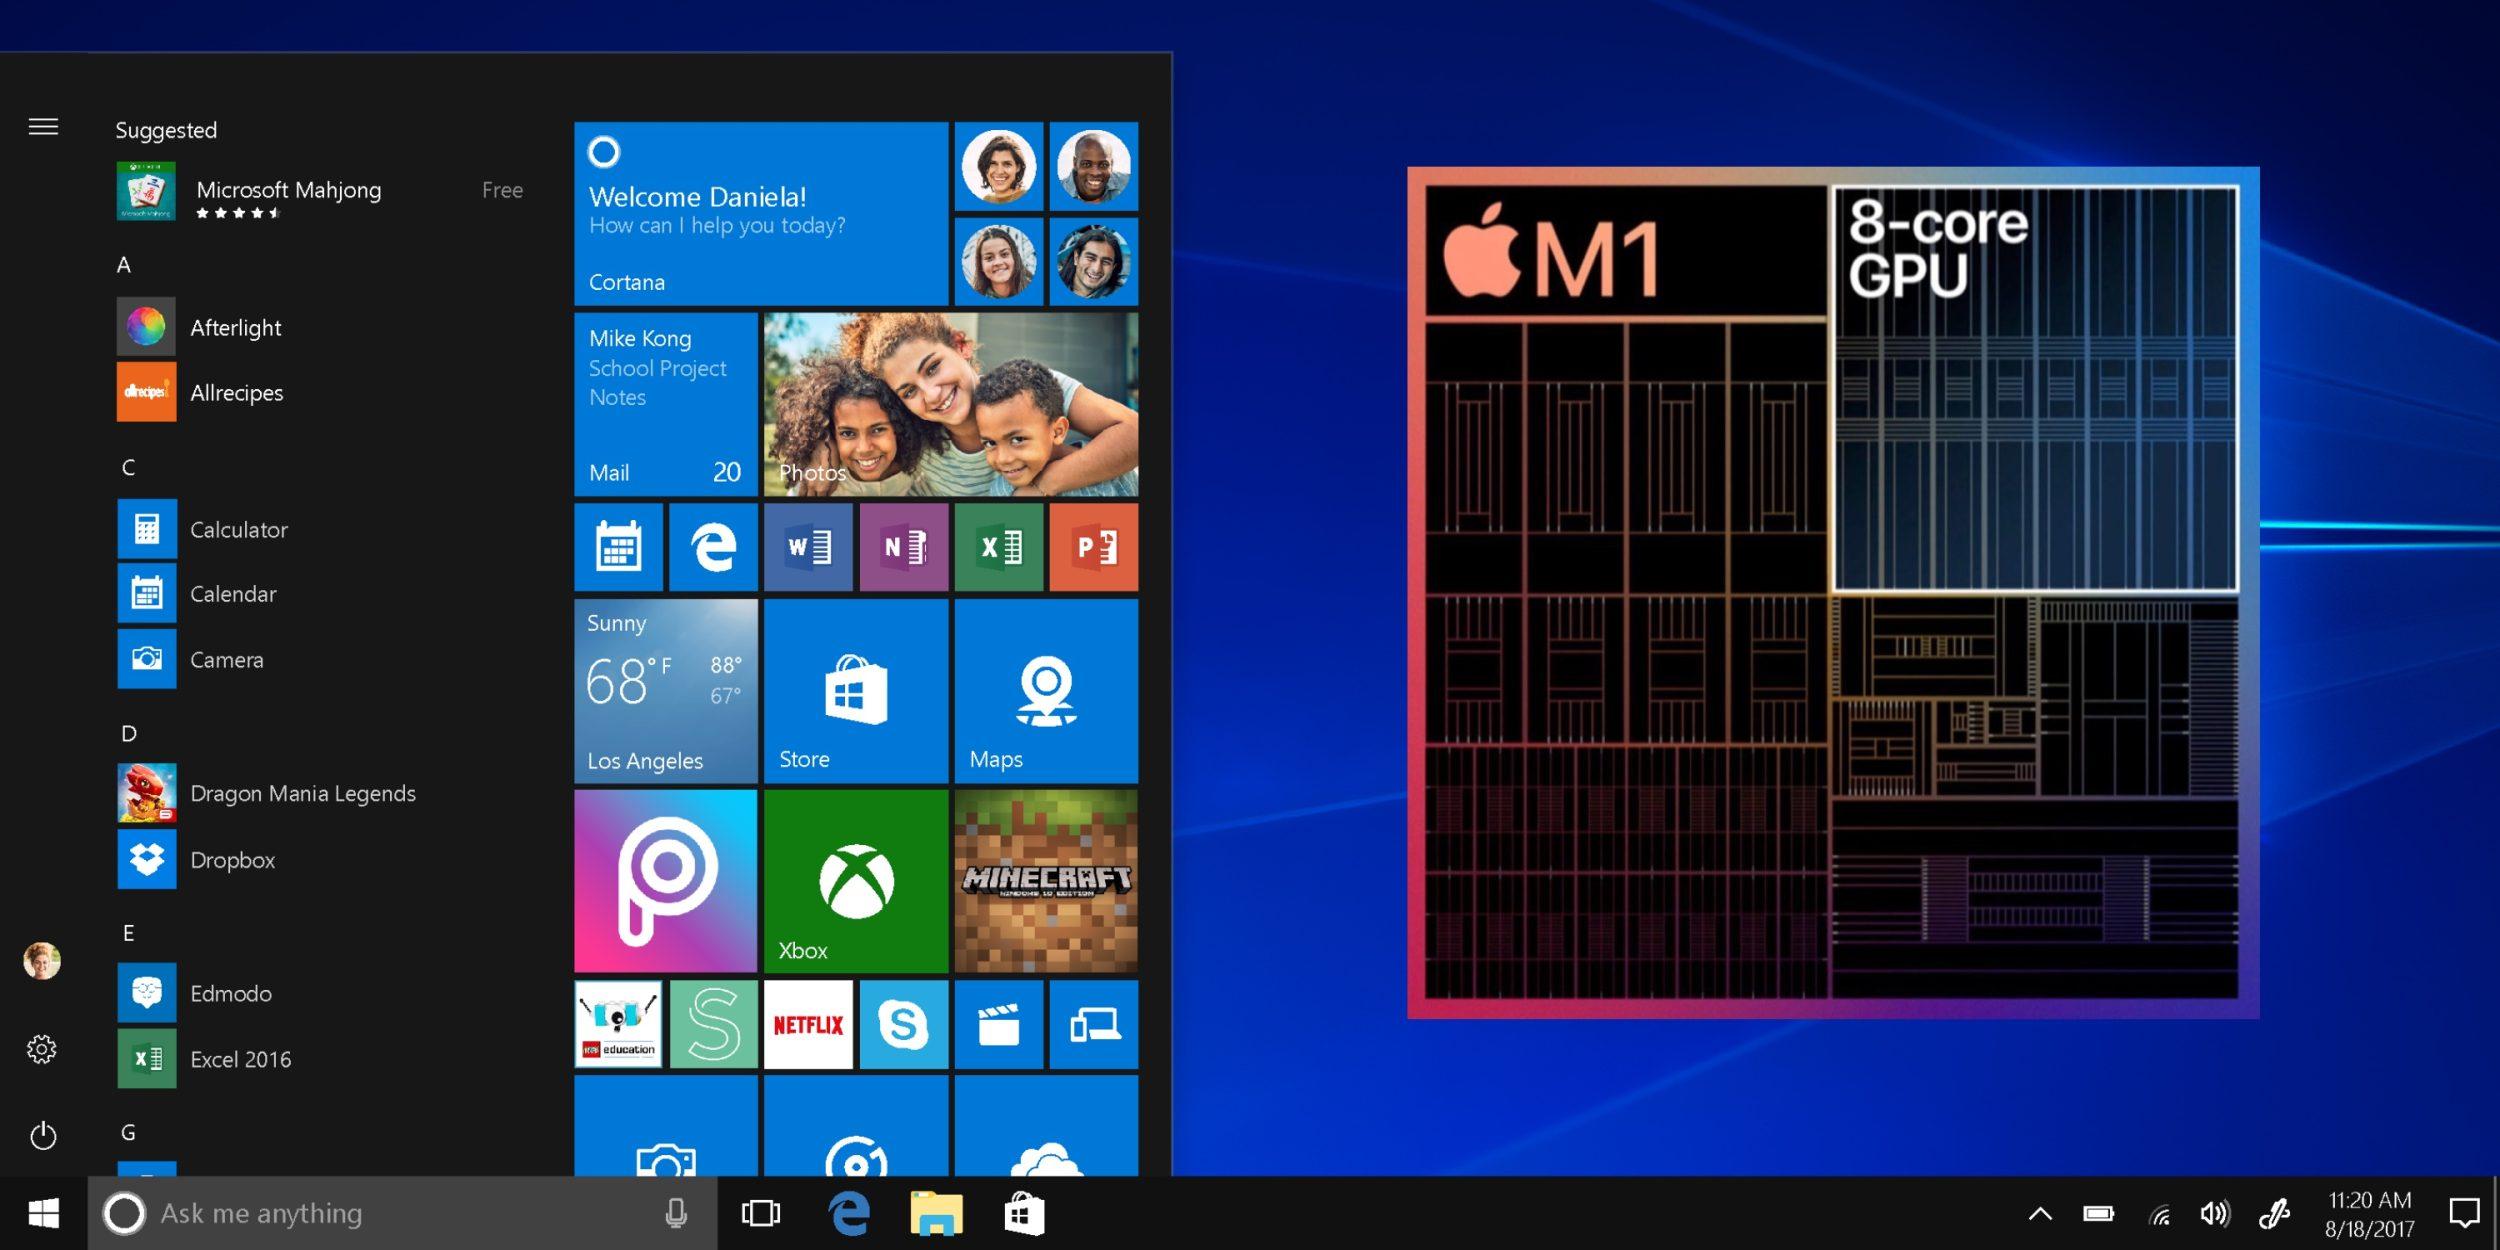 native-windows-support-m1-macs-apple-silicon.jpg?w=2500&quality=82&strip=all&ssl=1